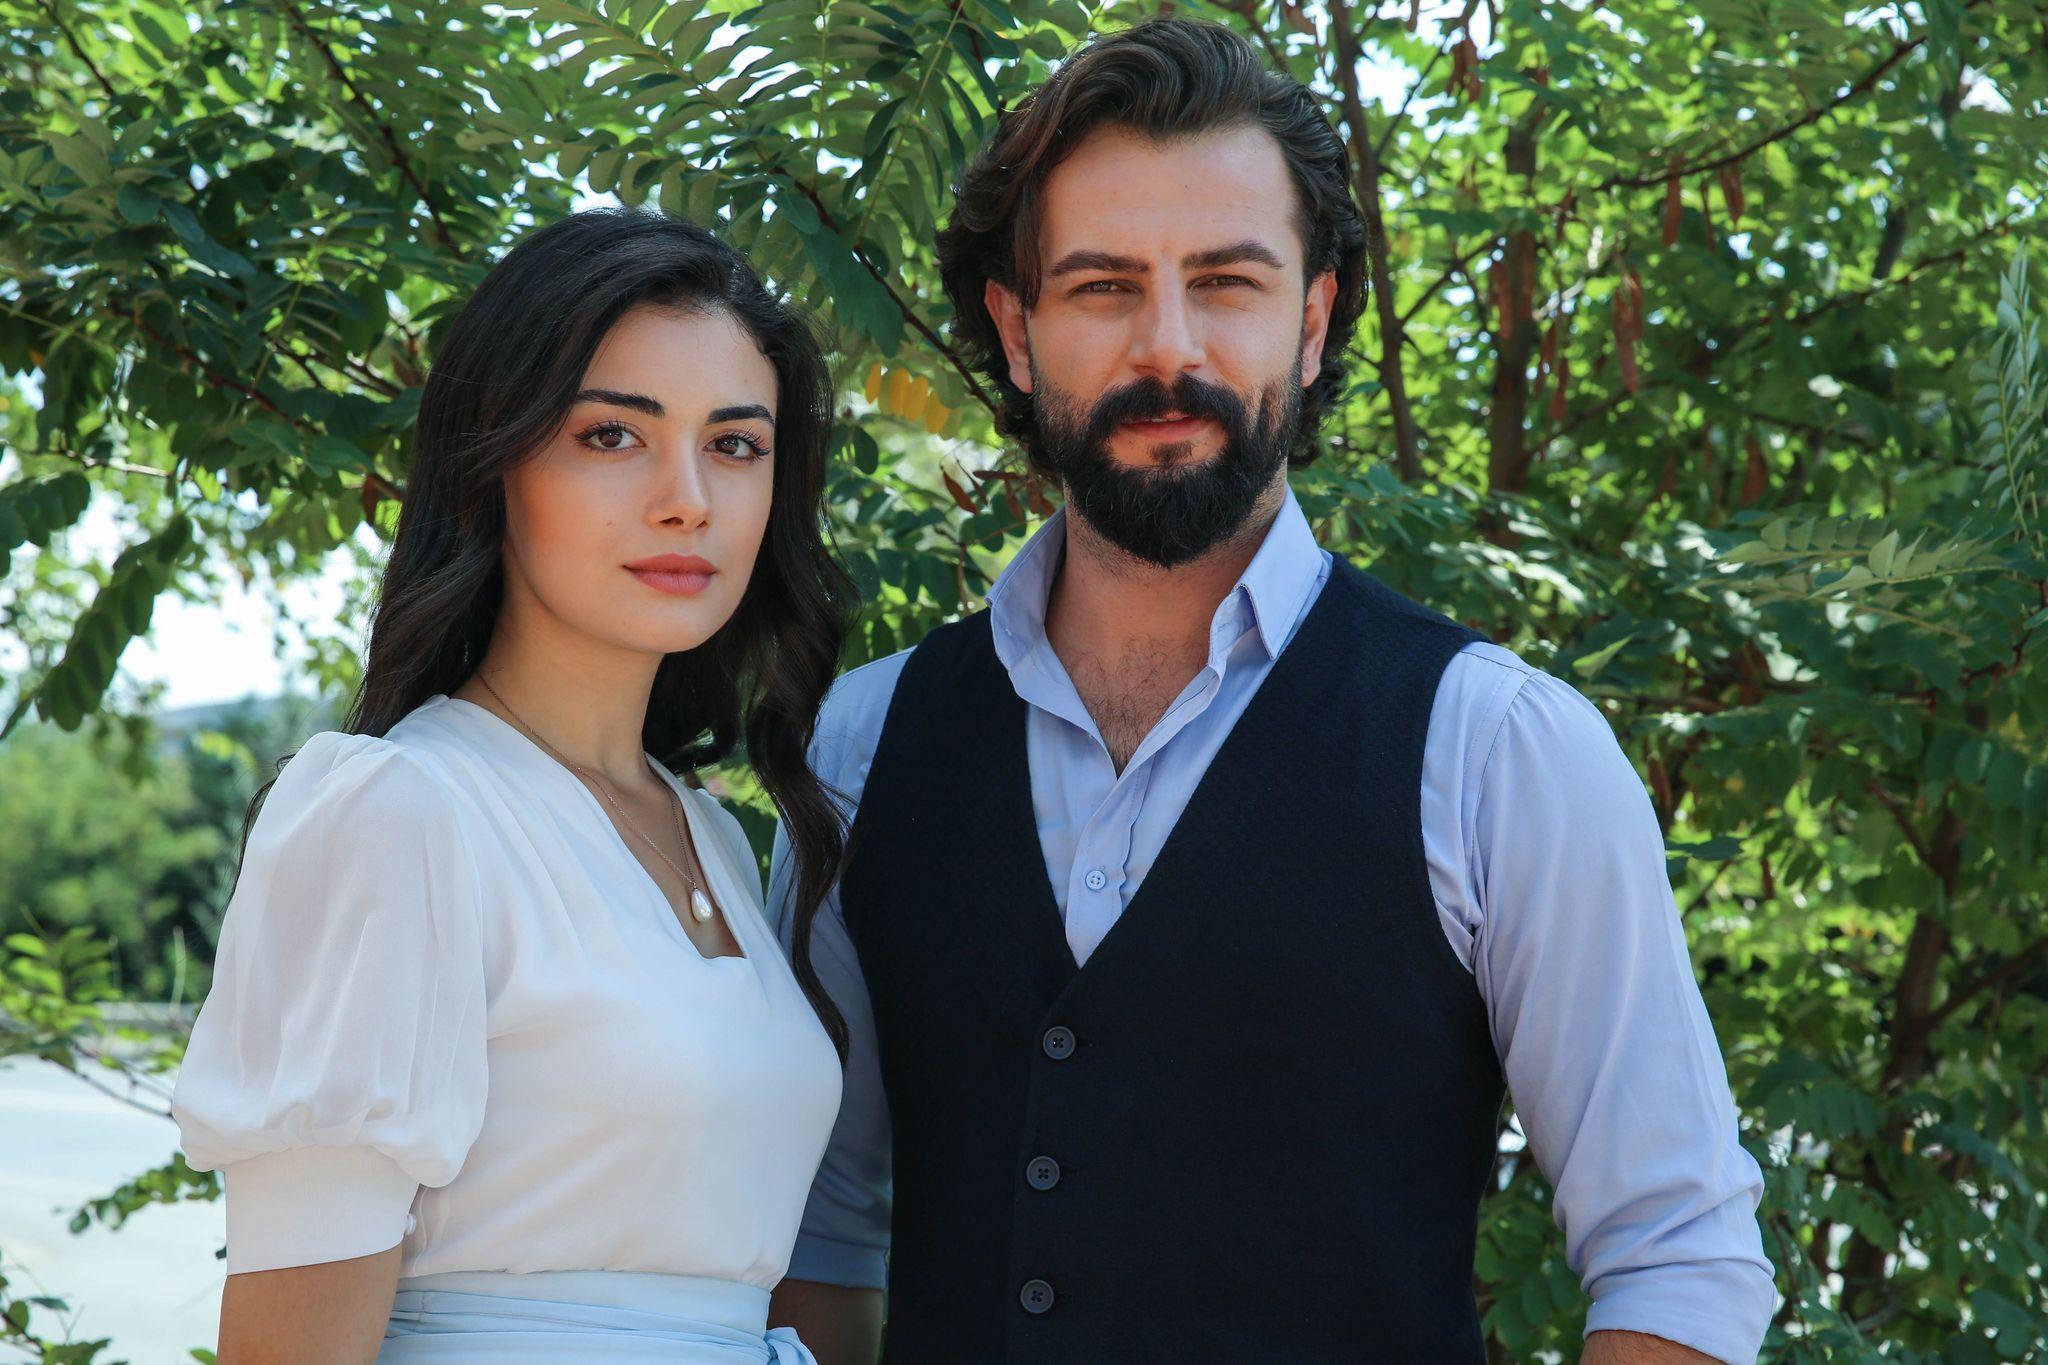 Ozge Yagiz has been in a relationship with her colleague Gokberk Demirci